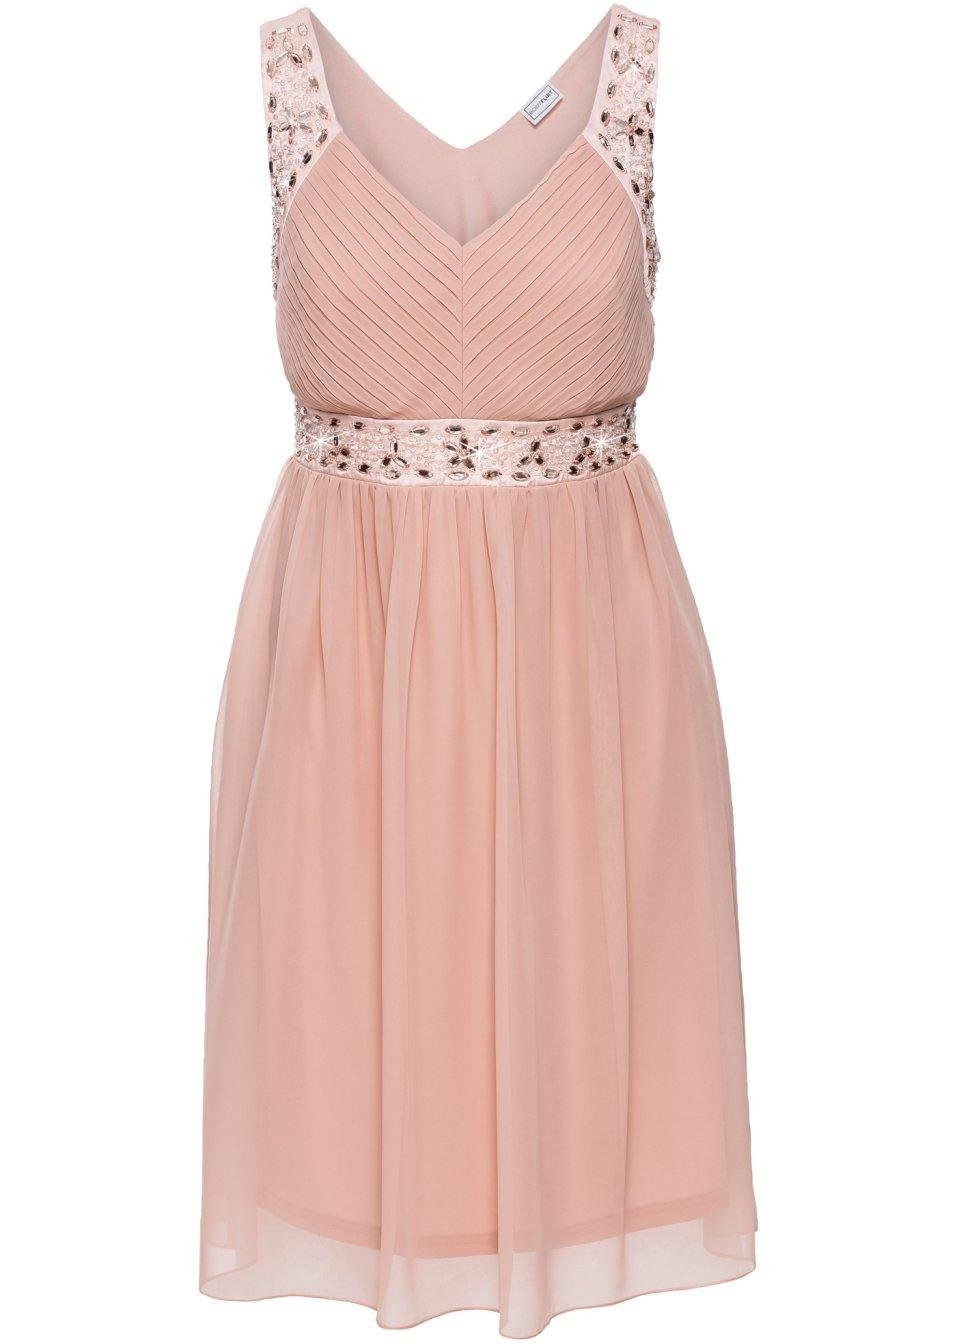 Designer Wunderbar Kleid Spitze Altrosa Galerie20 Erstaunlich Kleid Spitze Altrosa Bester Preis